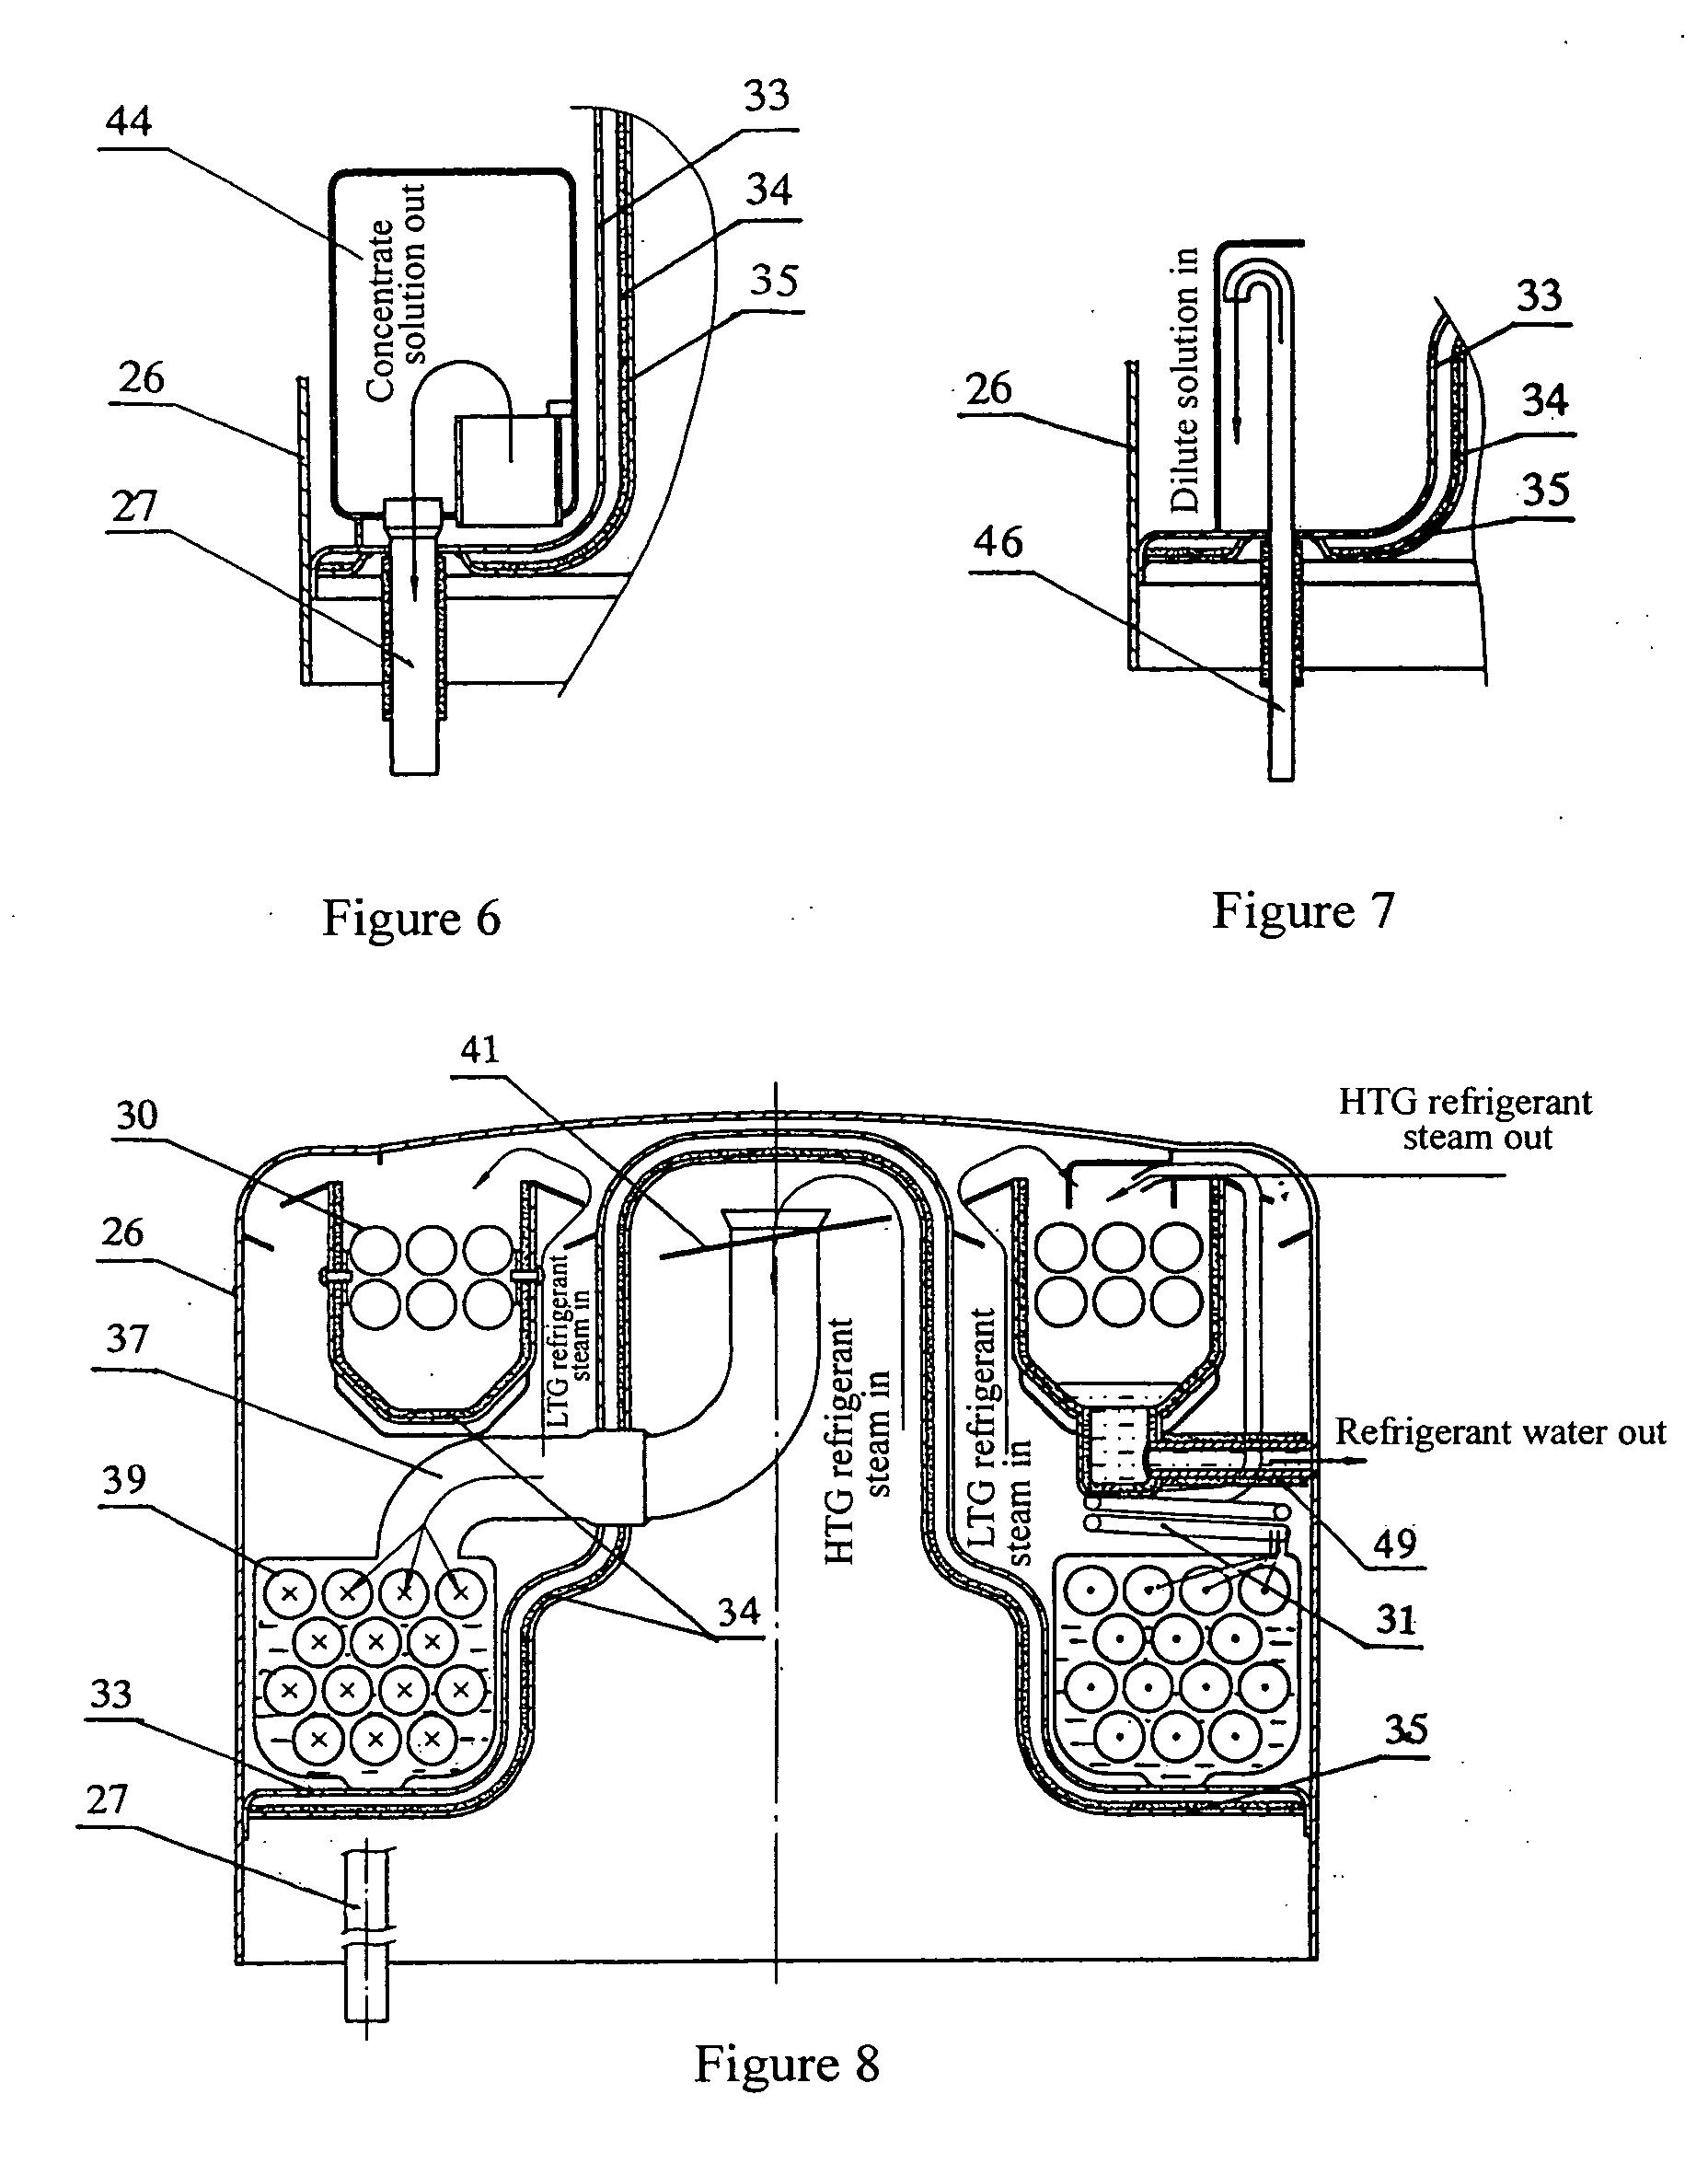 tags: #steam piping installation#steam coil diagram#one pipe steam piping  diagram#steam heat piping diagram#typical steam piping diagram#burnham v912  steam